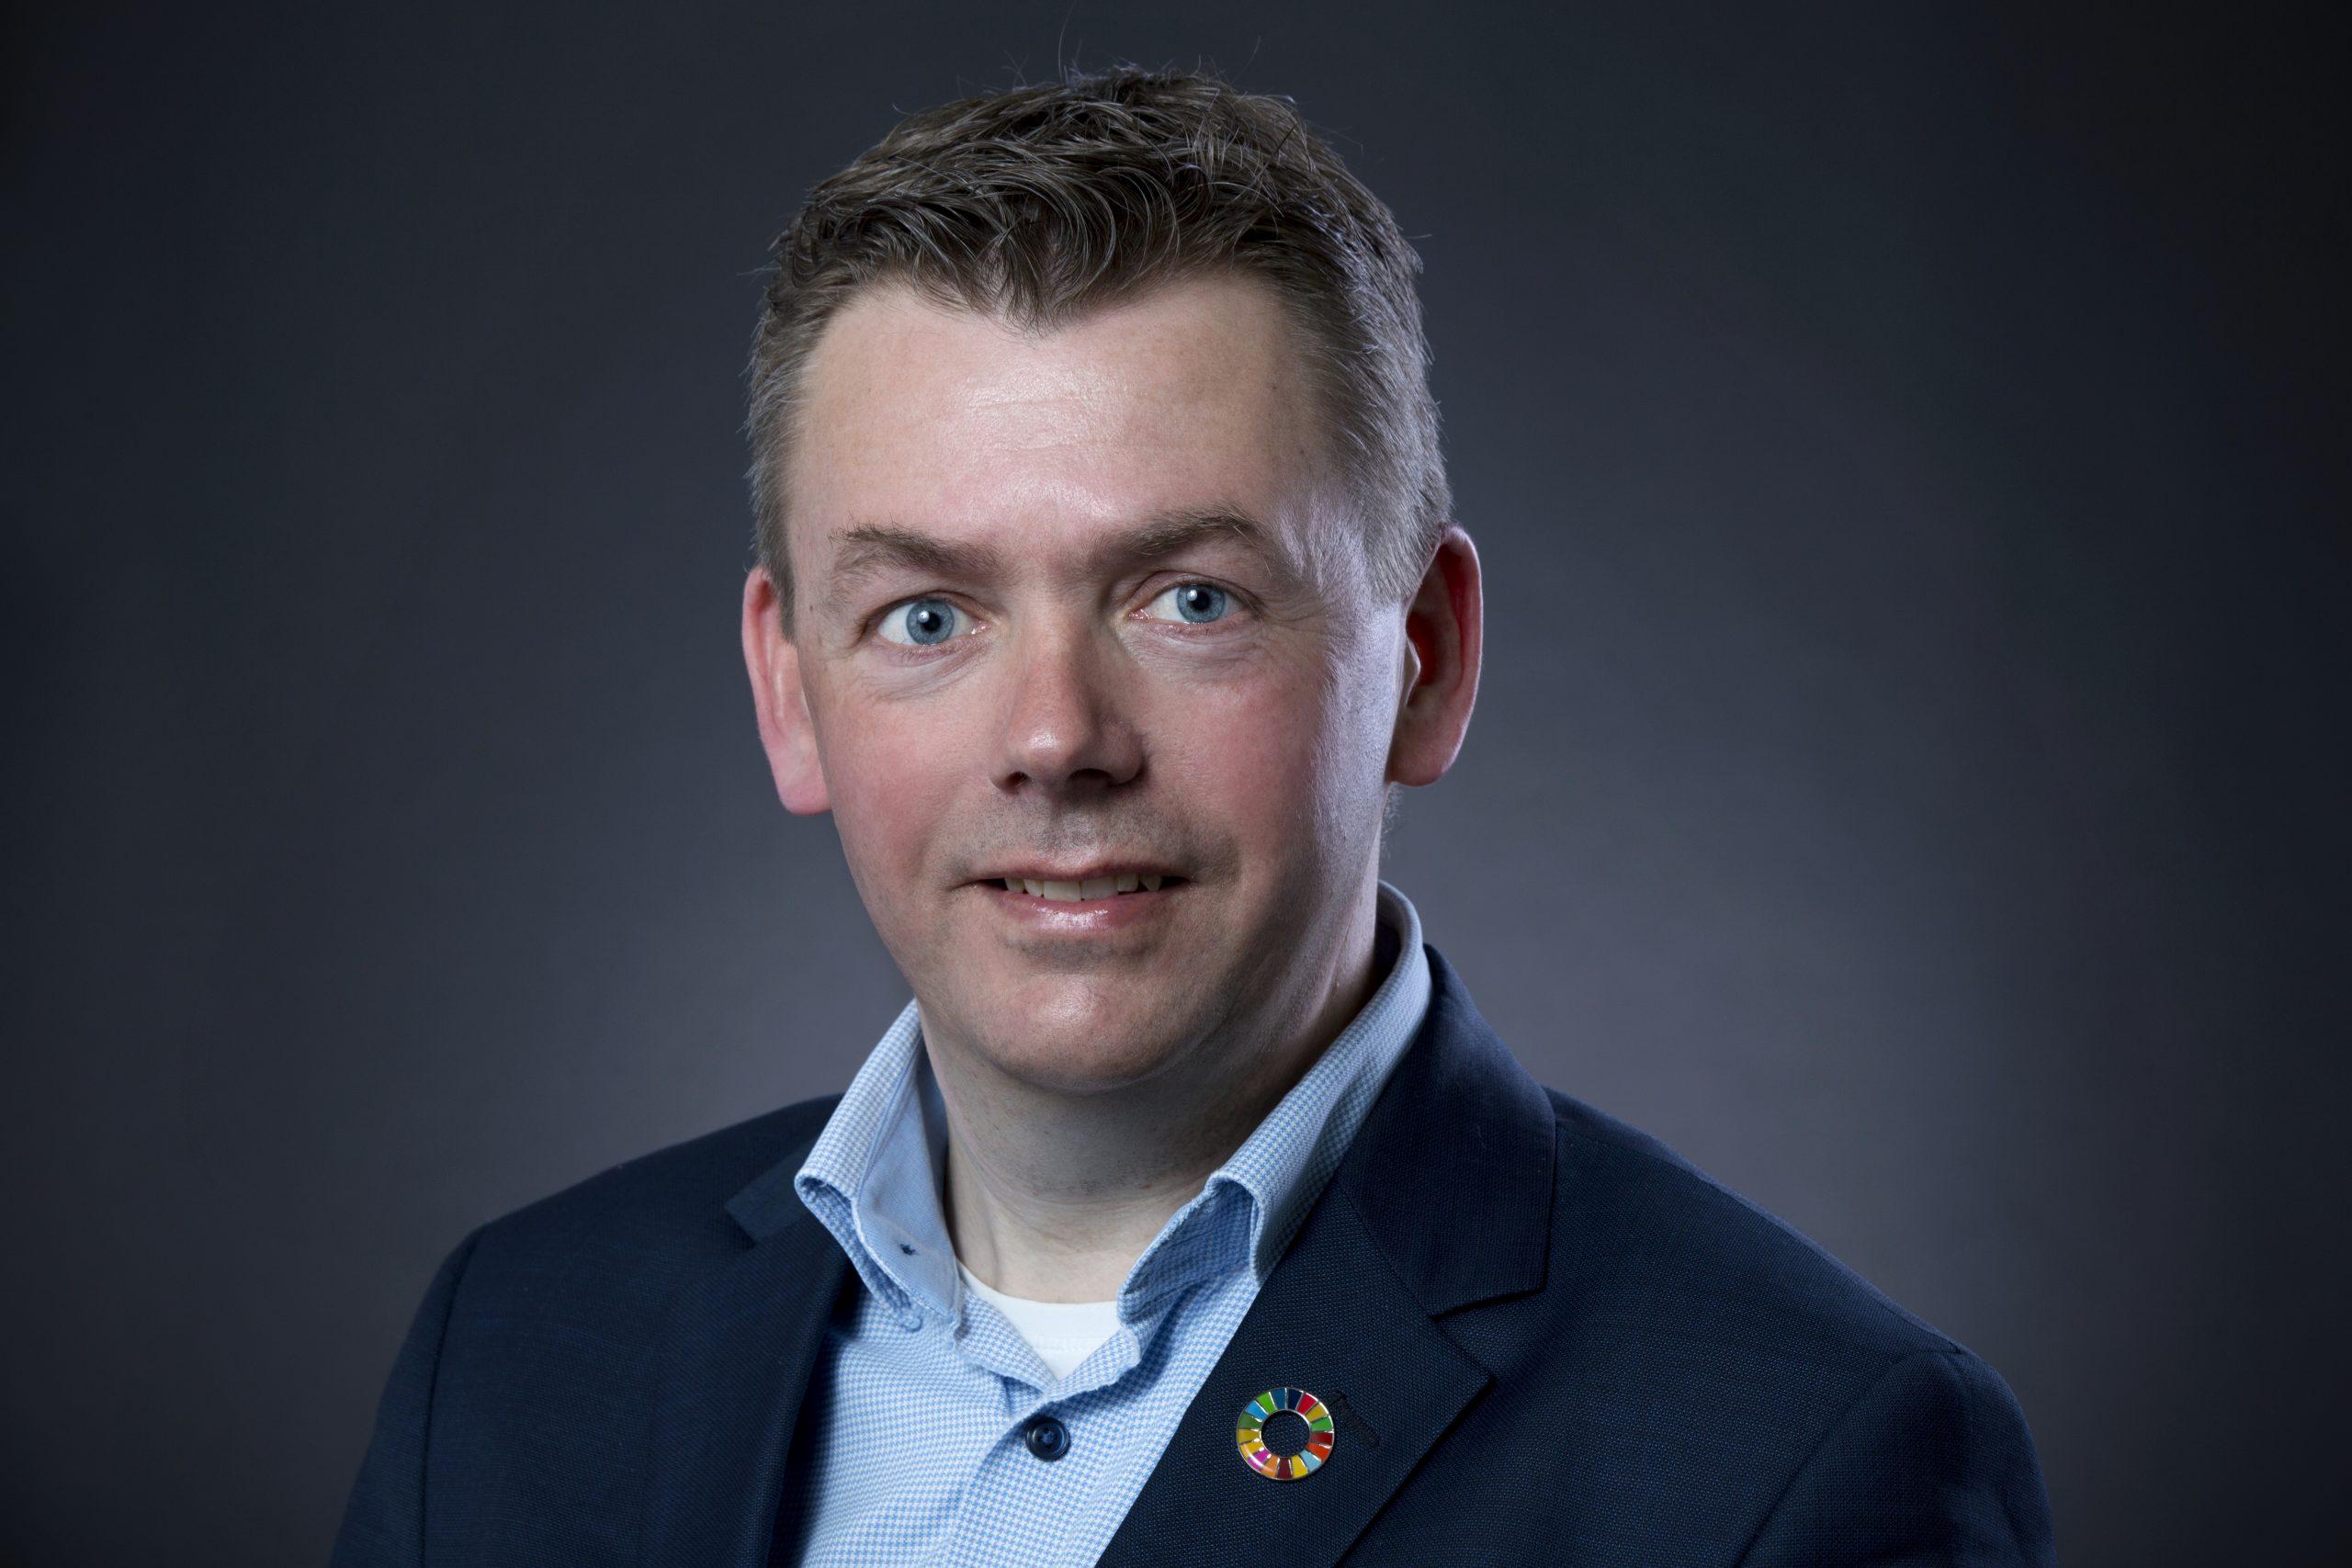 Maurice Jansen